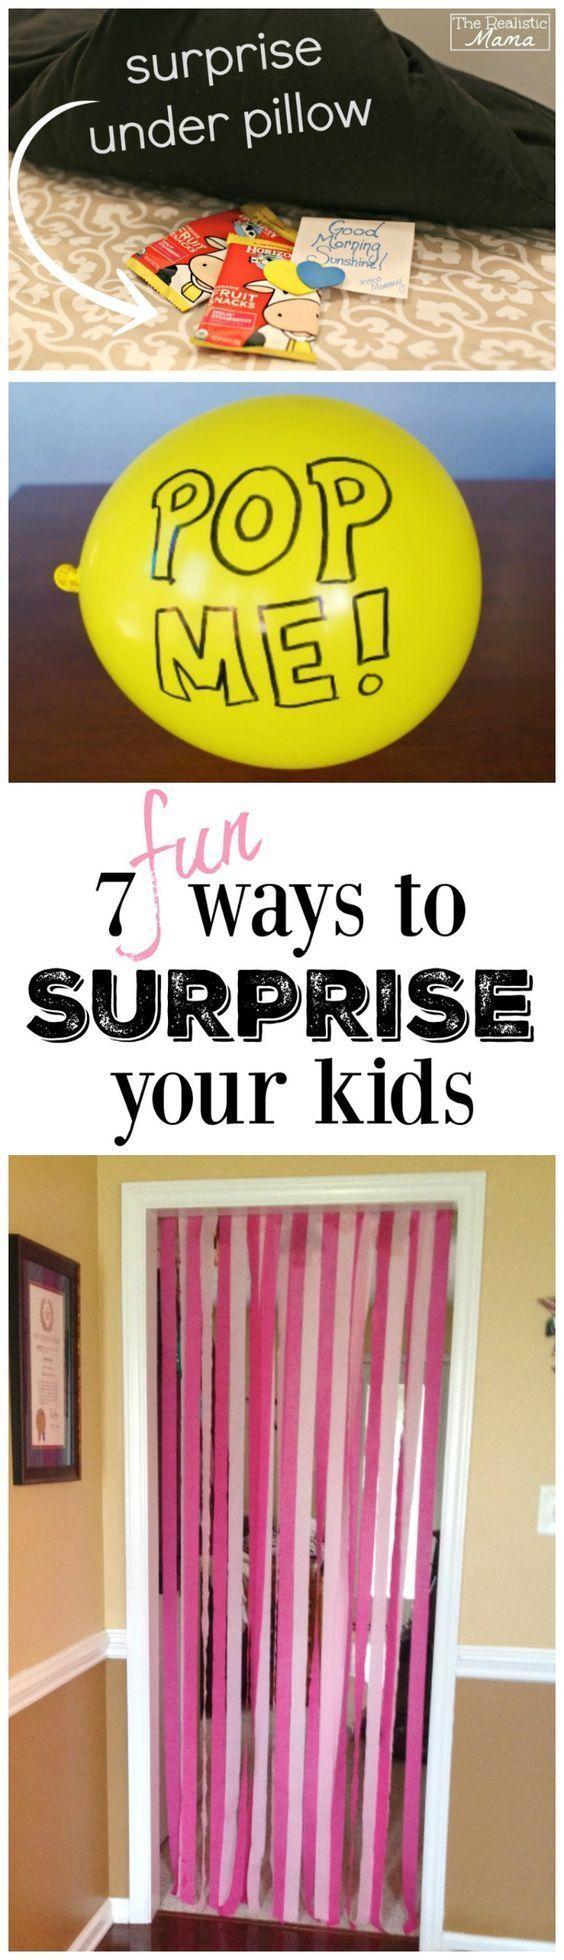 Fun ideas! 7 fun ways to surprise your kids - we did #7 this morning! #sp (scheduled via http://www.tailwindapp.com?utm_source=pinterest&utm_medium=twpin&utm_content=post116254099&utm_campaign=scheduler_attribution)